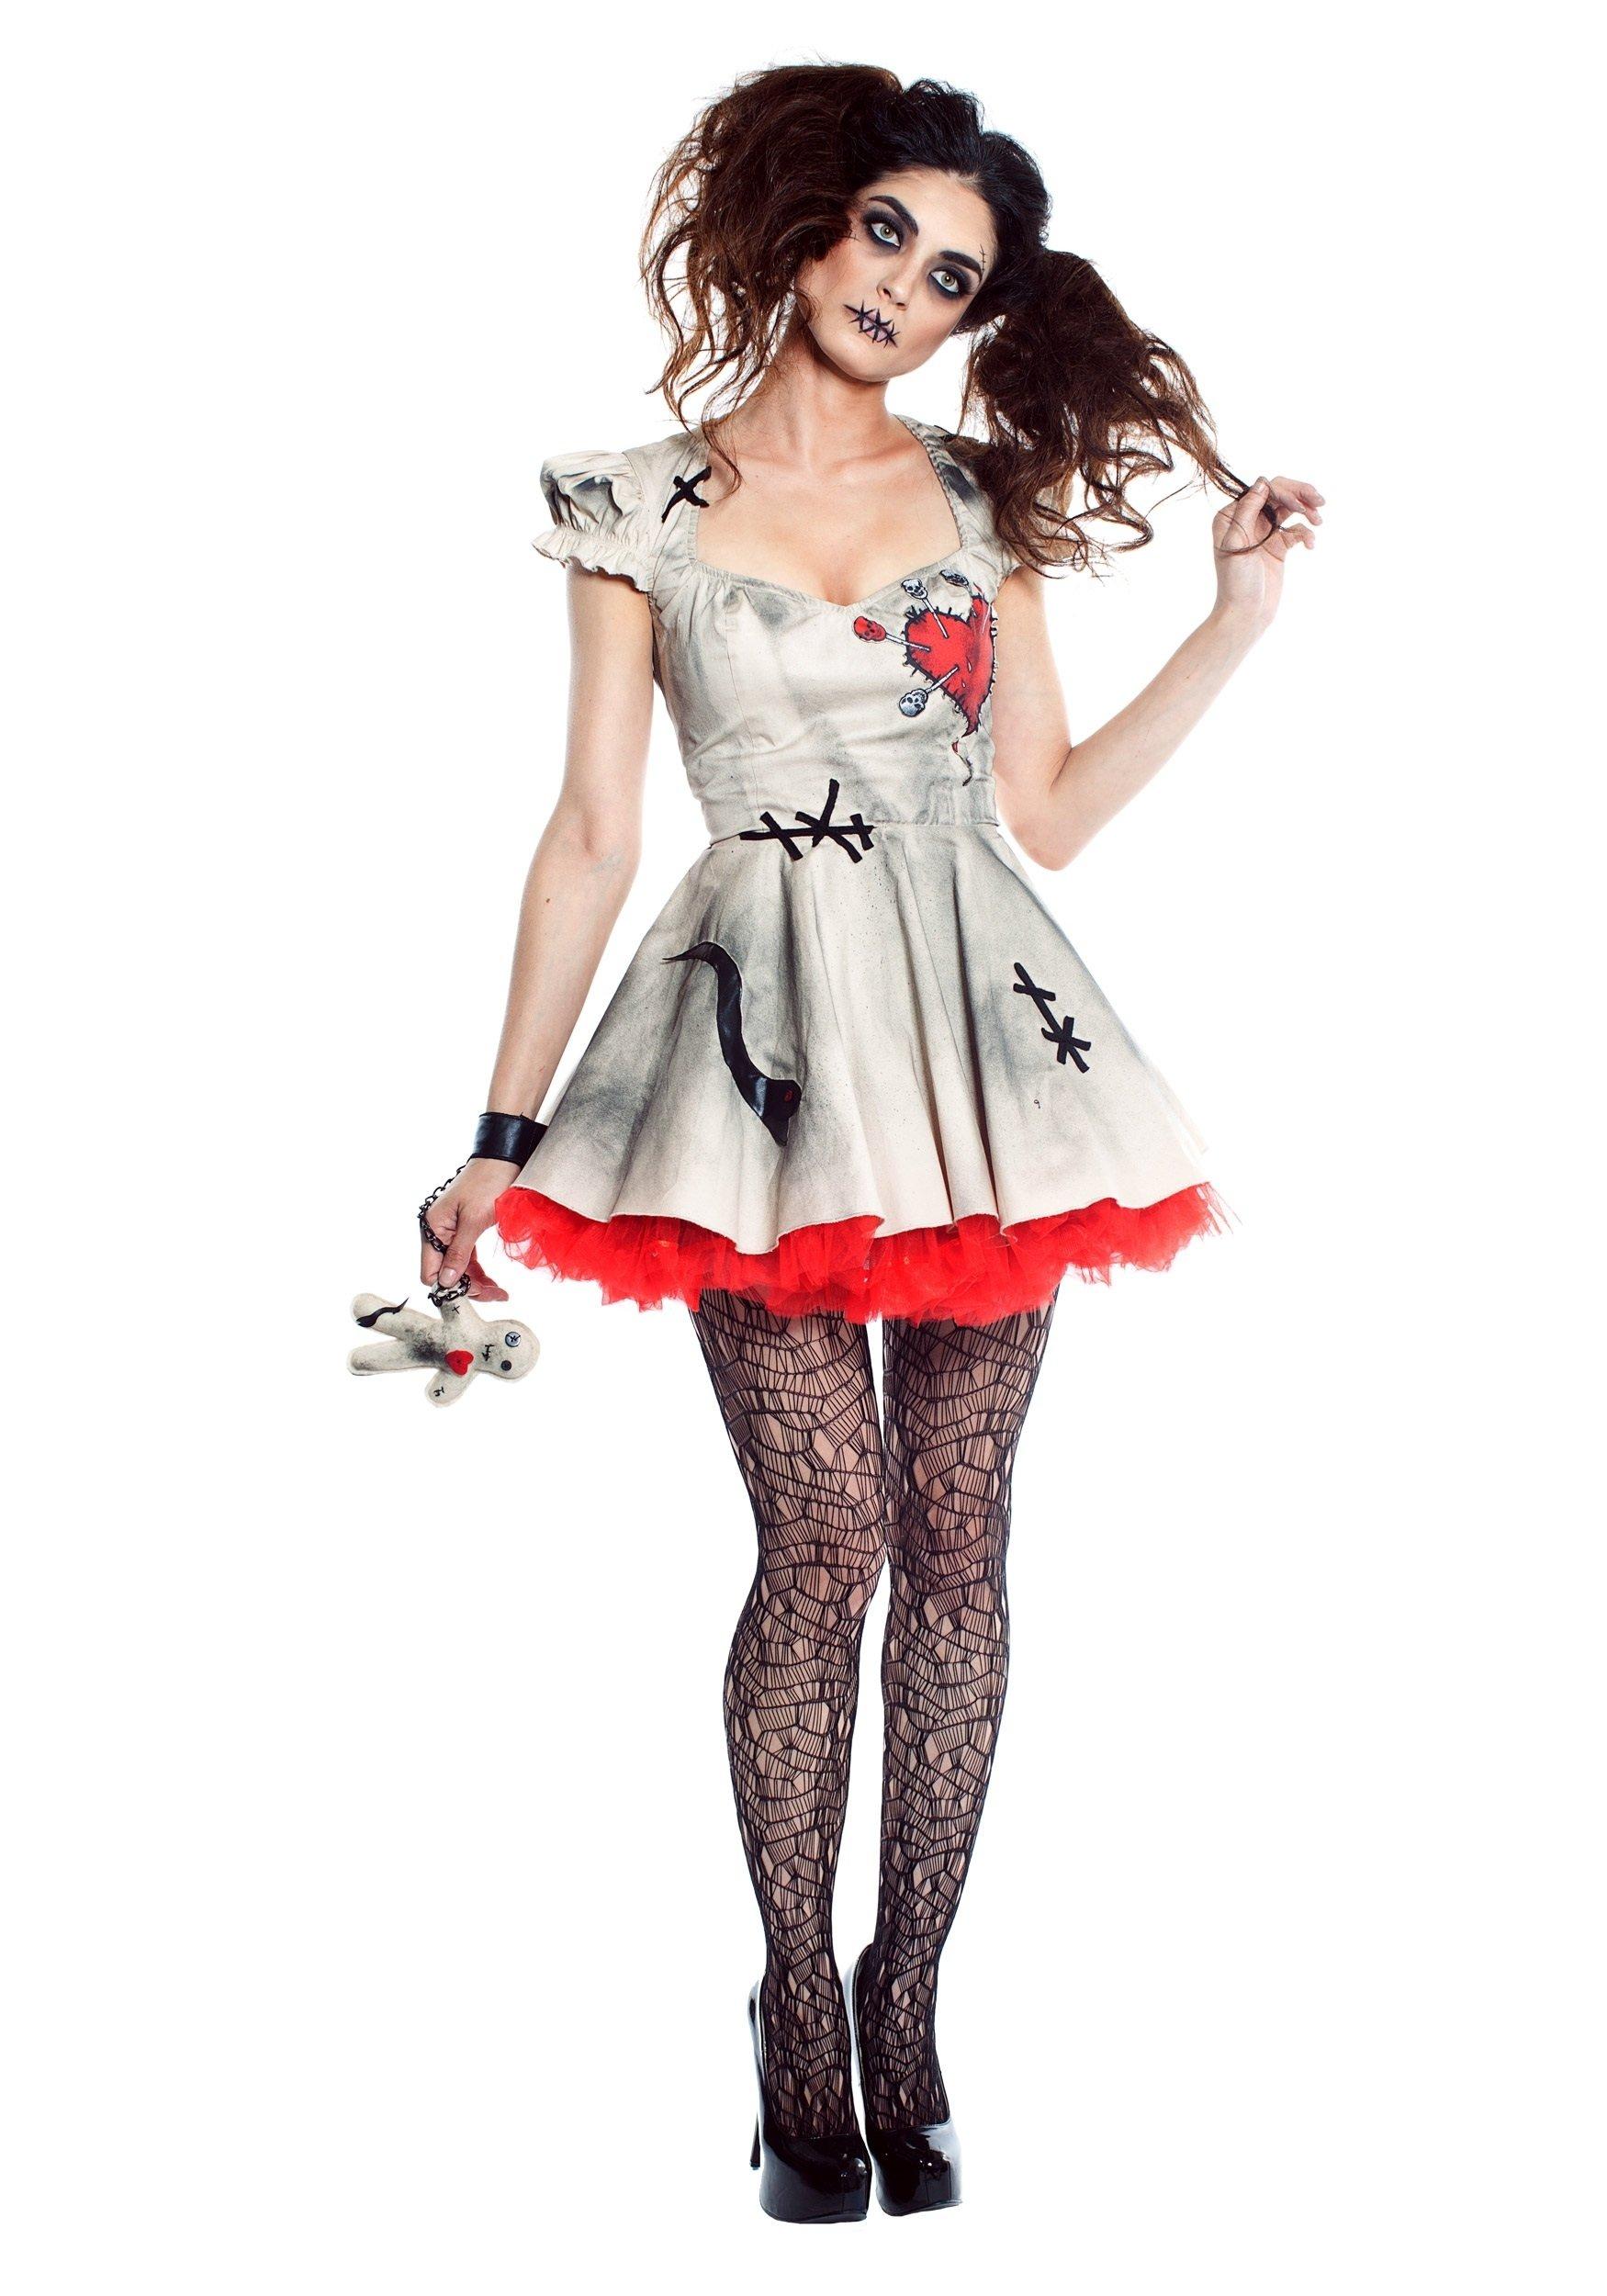 10 Stunning Halloween Costumes For Women Ideas womens voodoo doll costume 1 2020